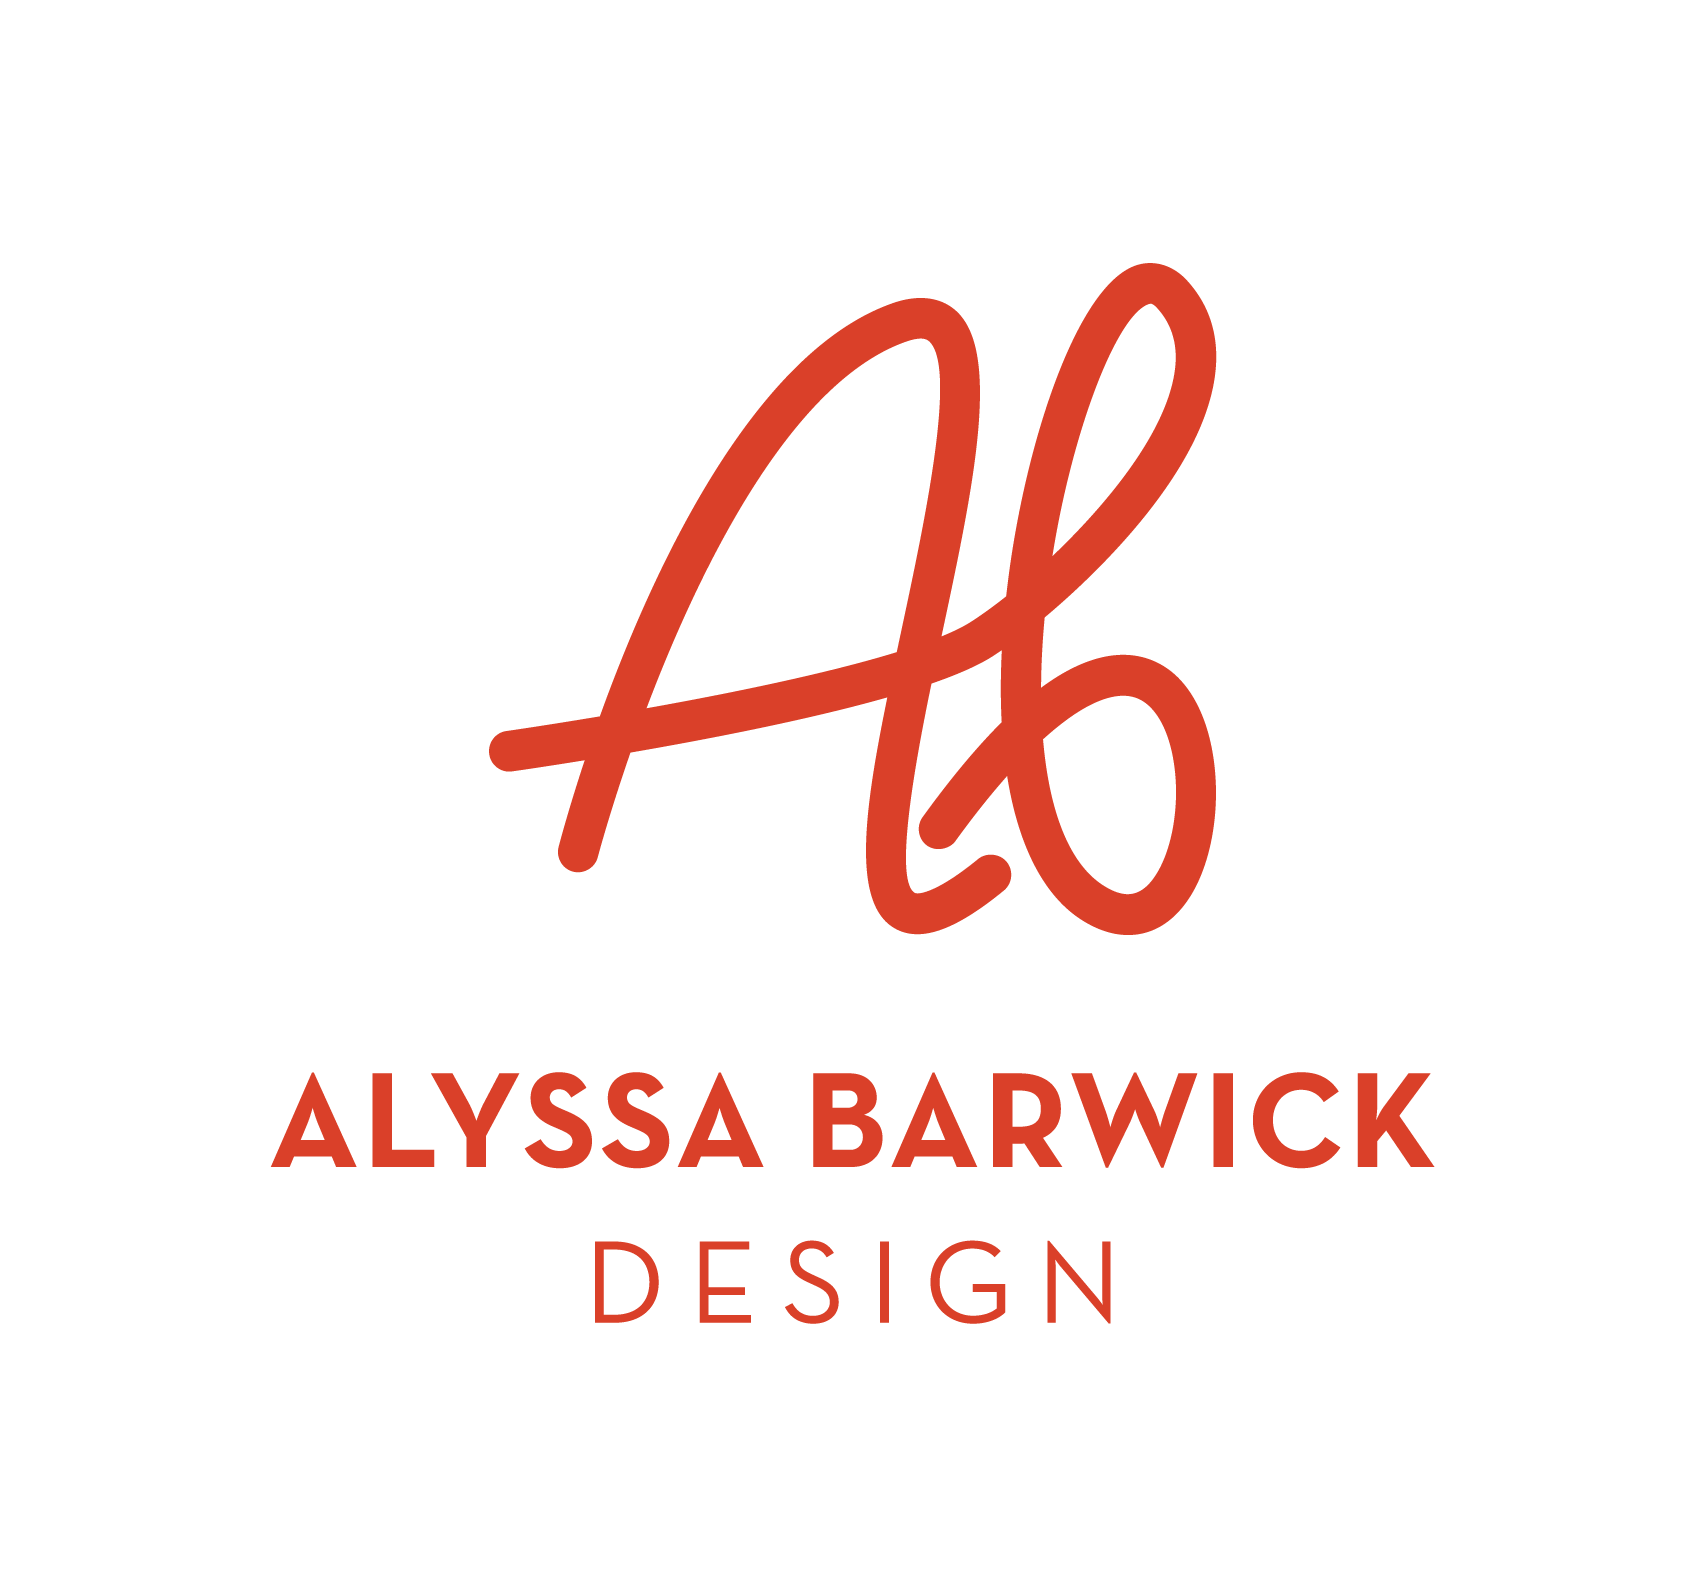 Alyssa Barwick Design